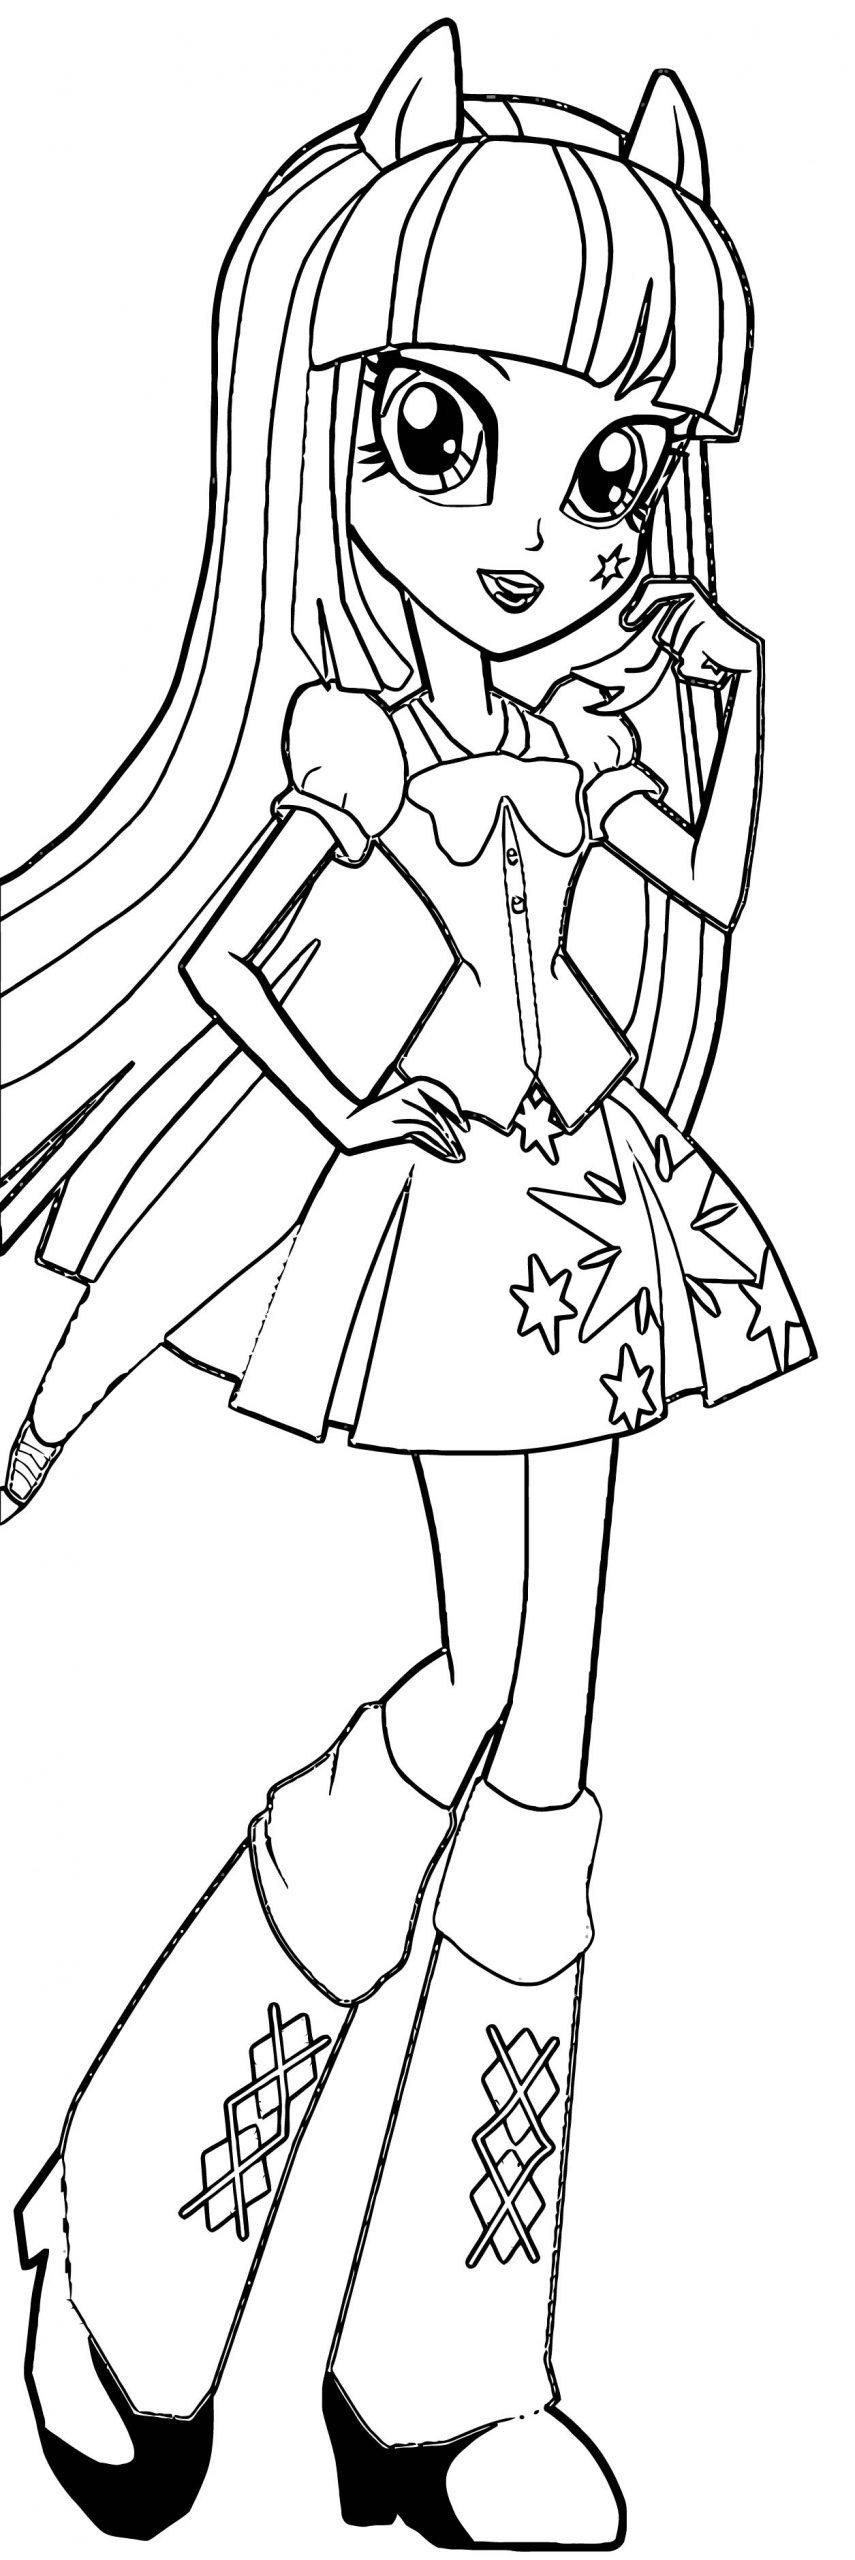 Princess Twilight Sparkle Coloring Page 453